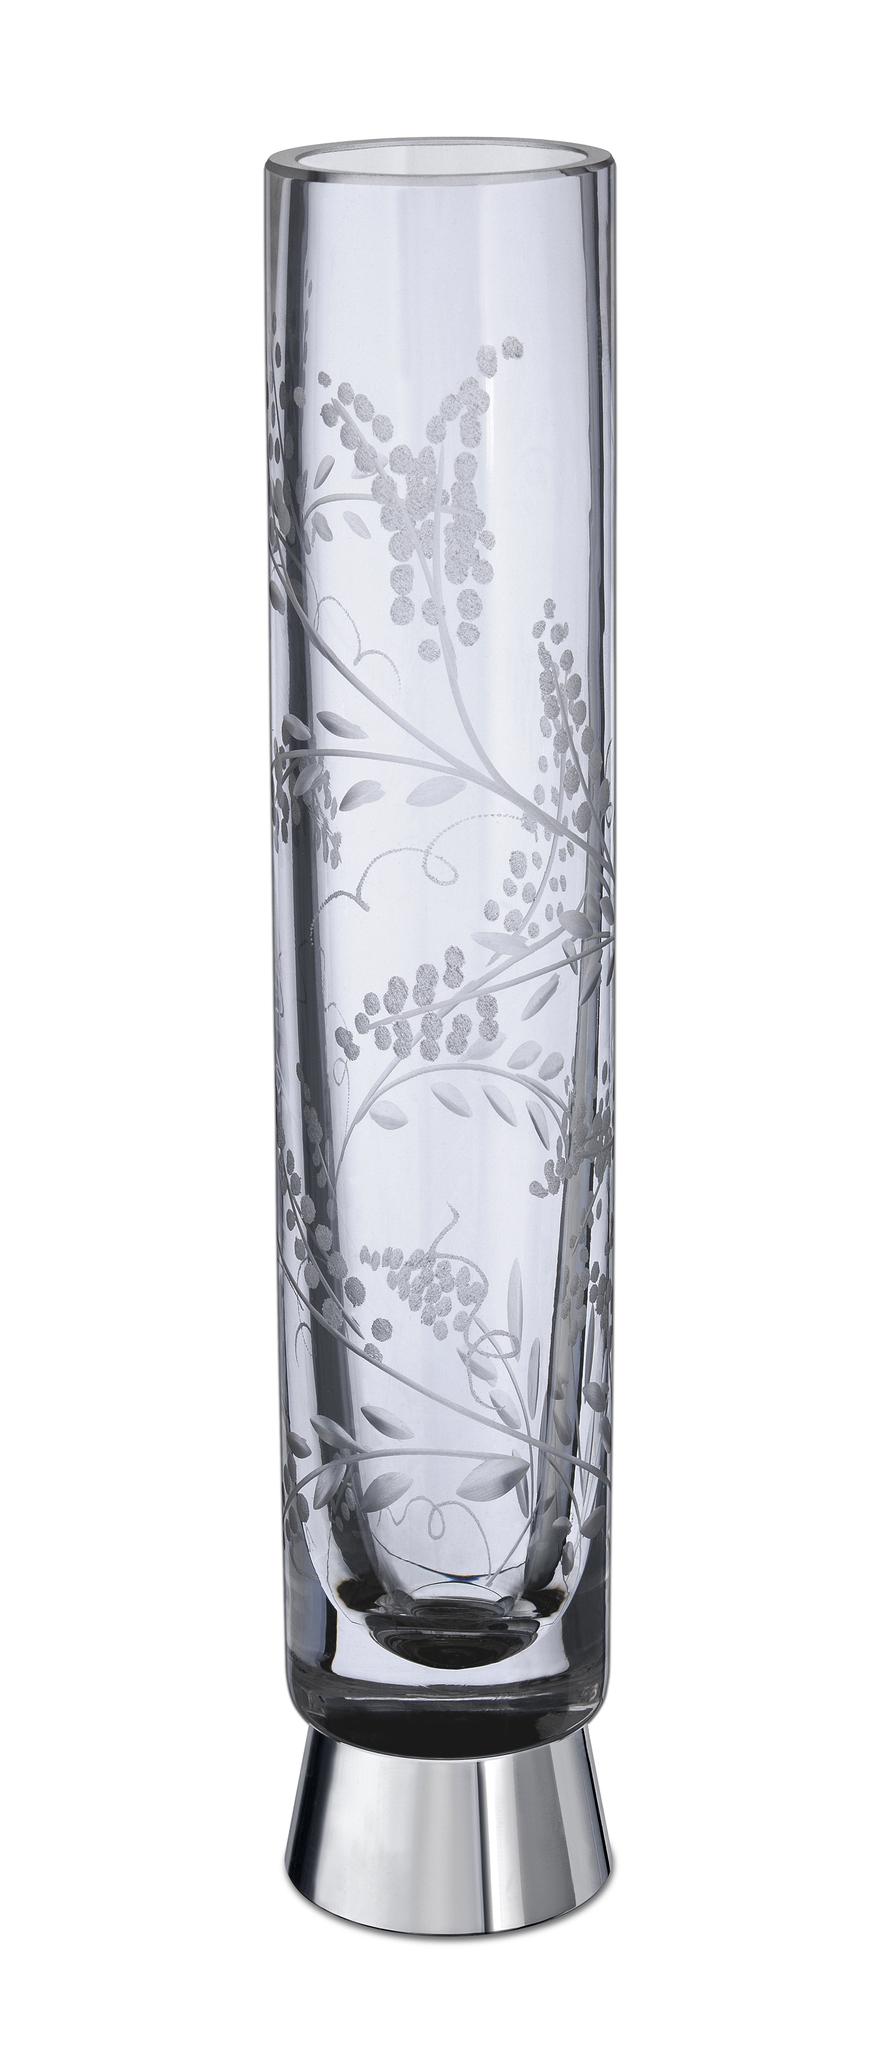 Вазы настольные Элитная ваза 61181CR Barocco от Windisch elitnaya-vaza-61181-barocco-ot-windisch-ispaniya.jpg